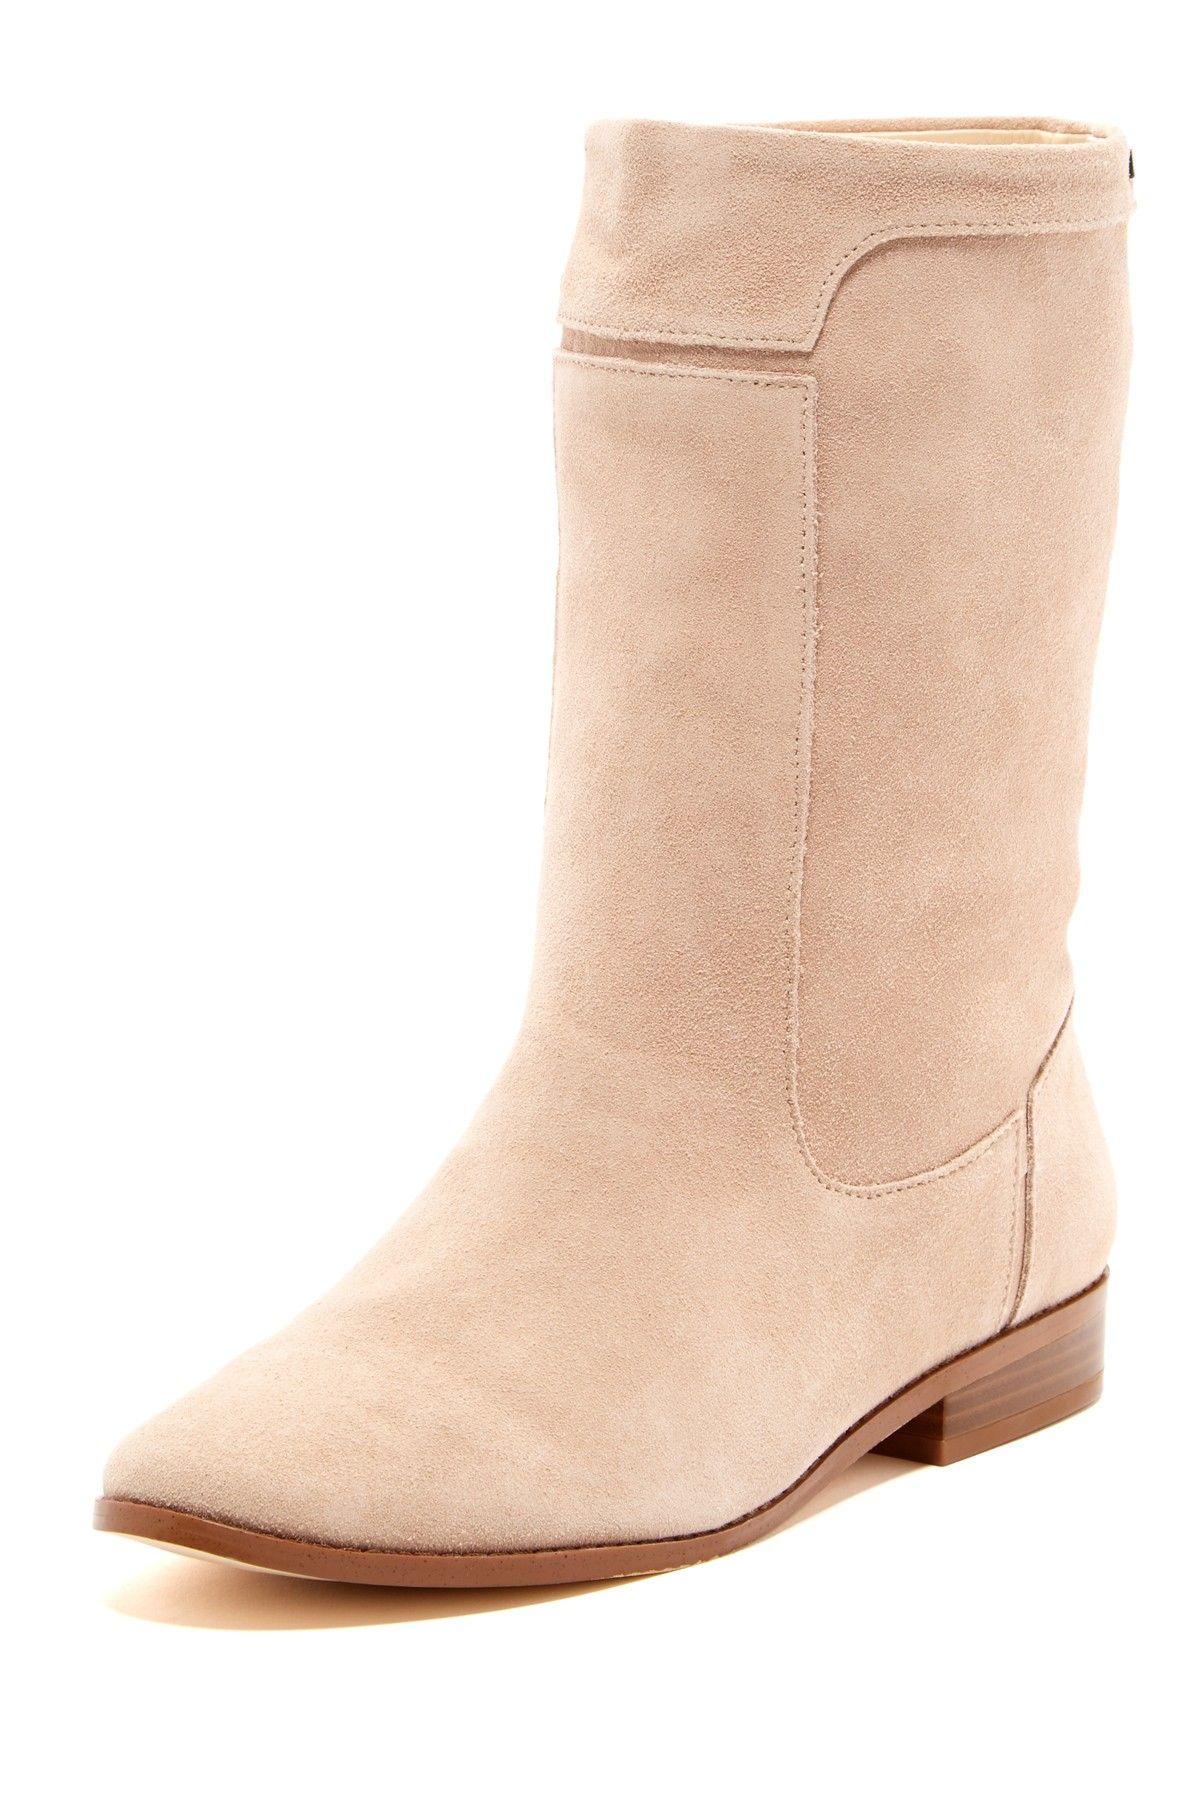 Calvin Klein Clarisa Suede Boots//